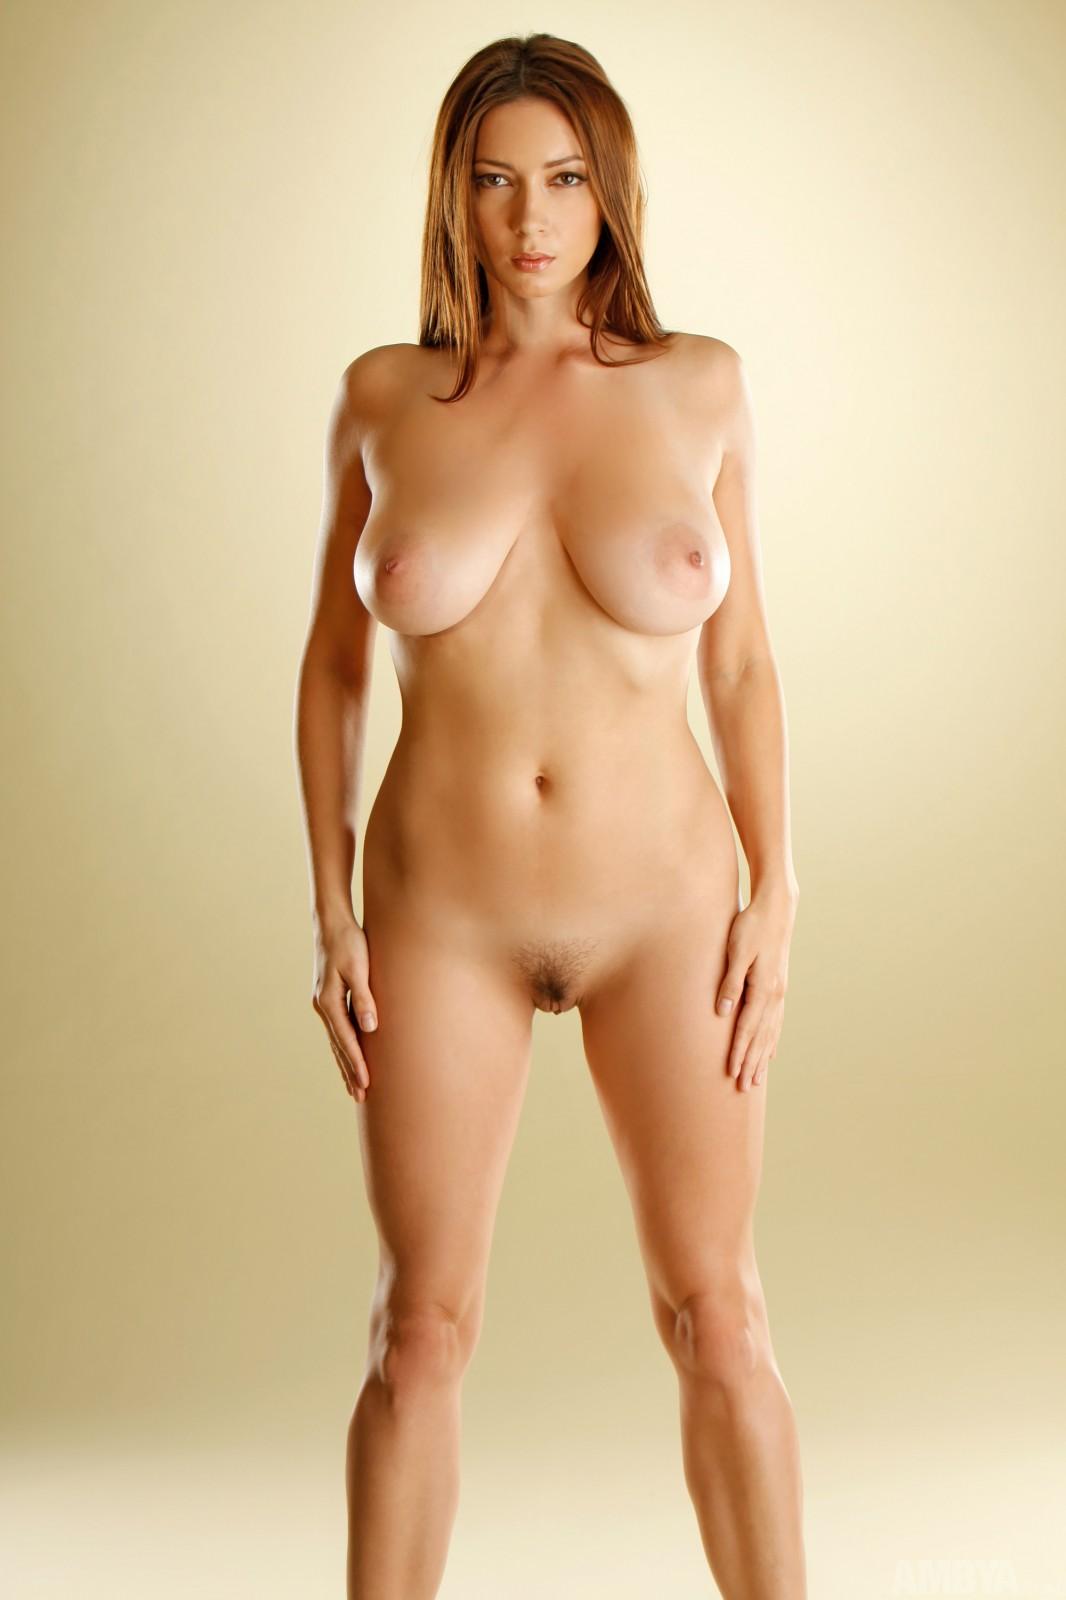 Nudes from kik